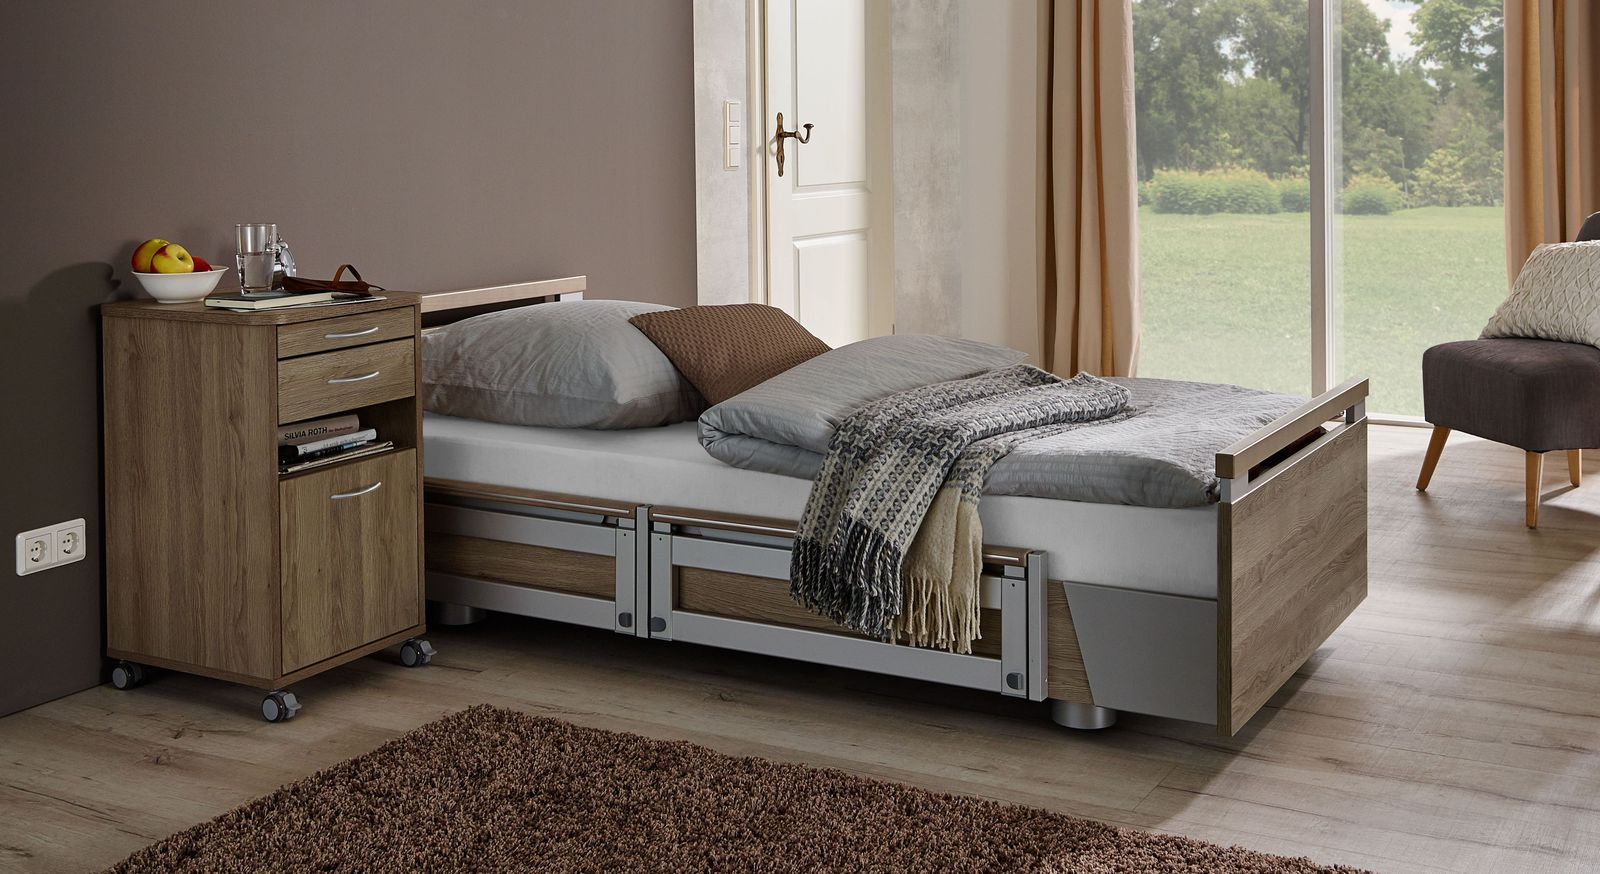 Komfortbett mit Pflegebett-Funktion Usedom in niedriger Position